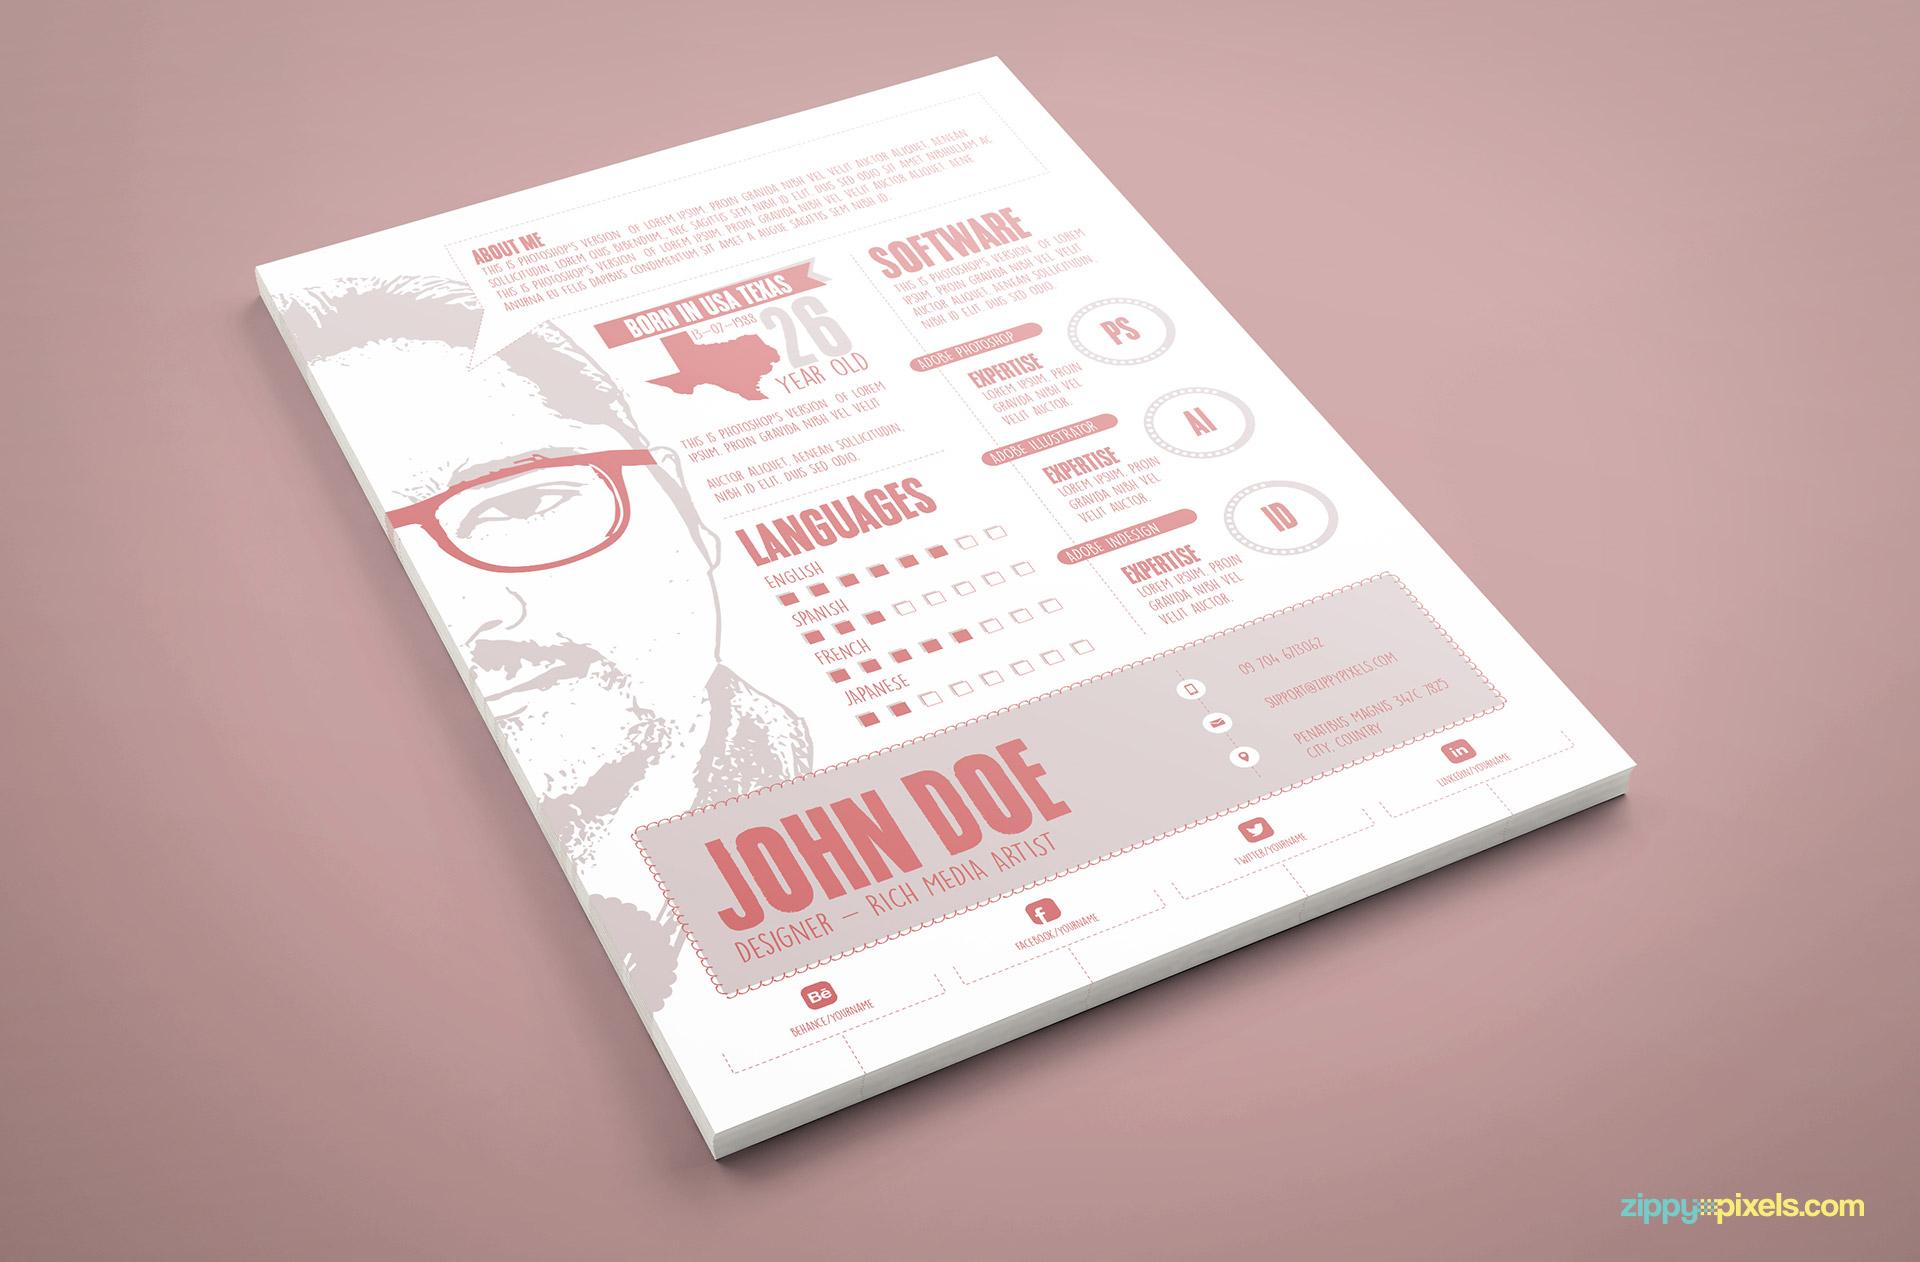 Graphic Designer Resume Template - PSD & AI | ZippyPixels